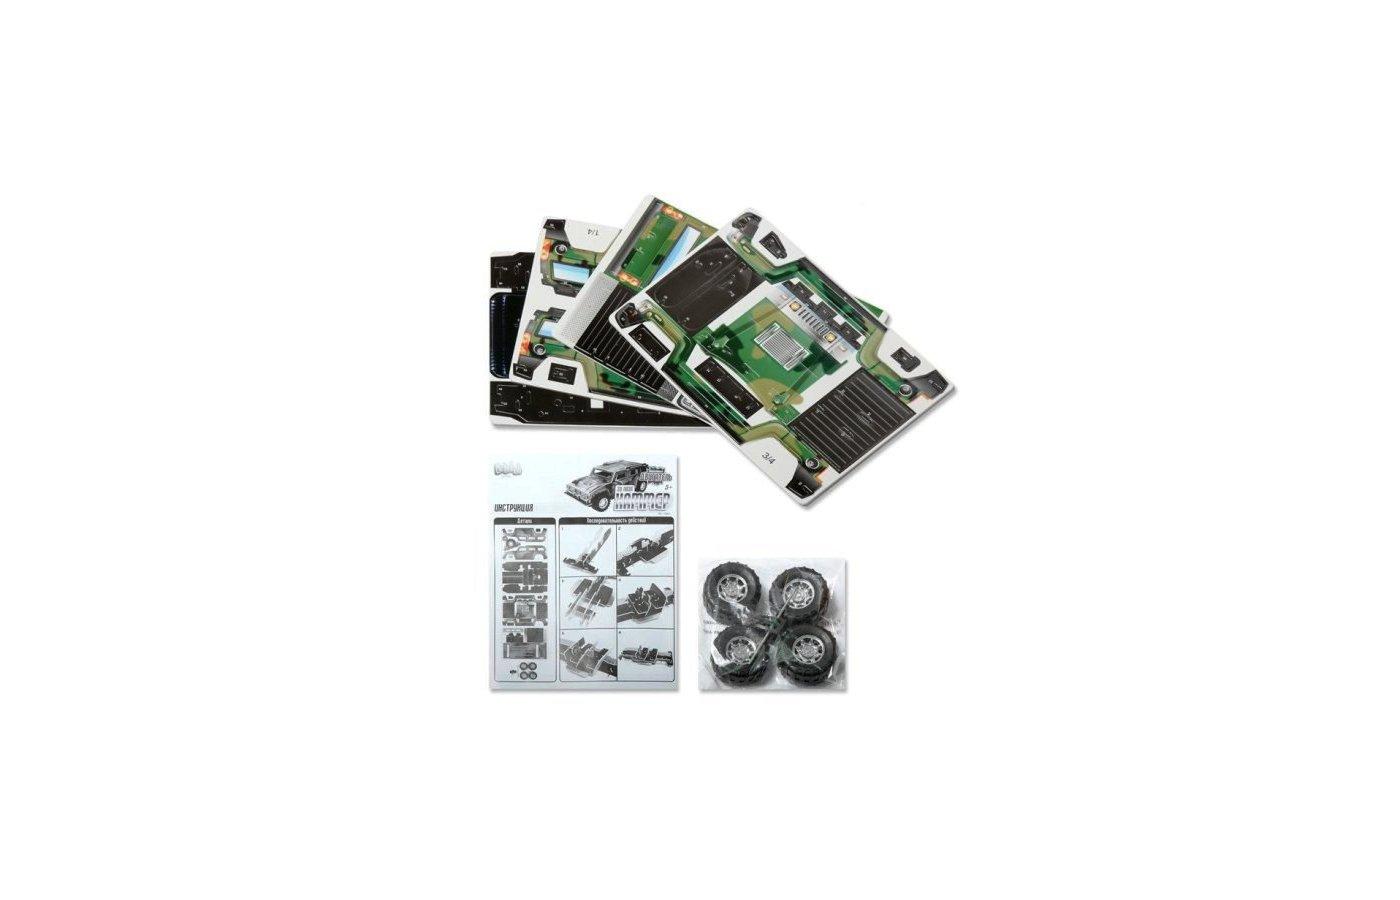 Конструктор Bebelot Basic ВВА0712-106 3D пазл Хаммер